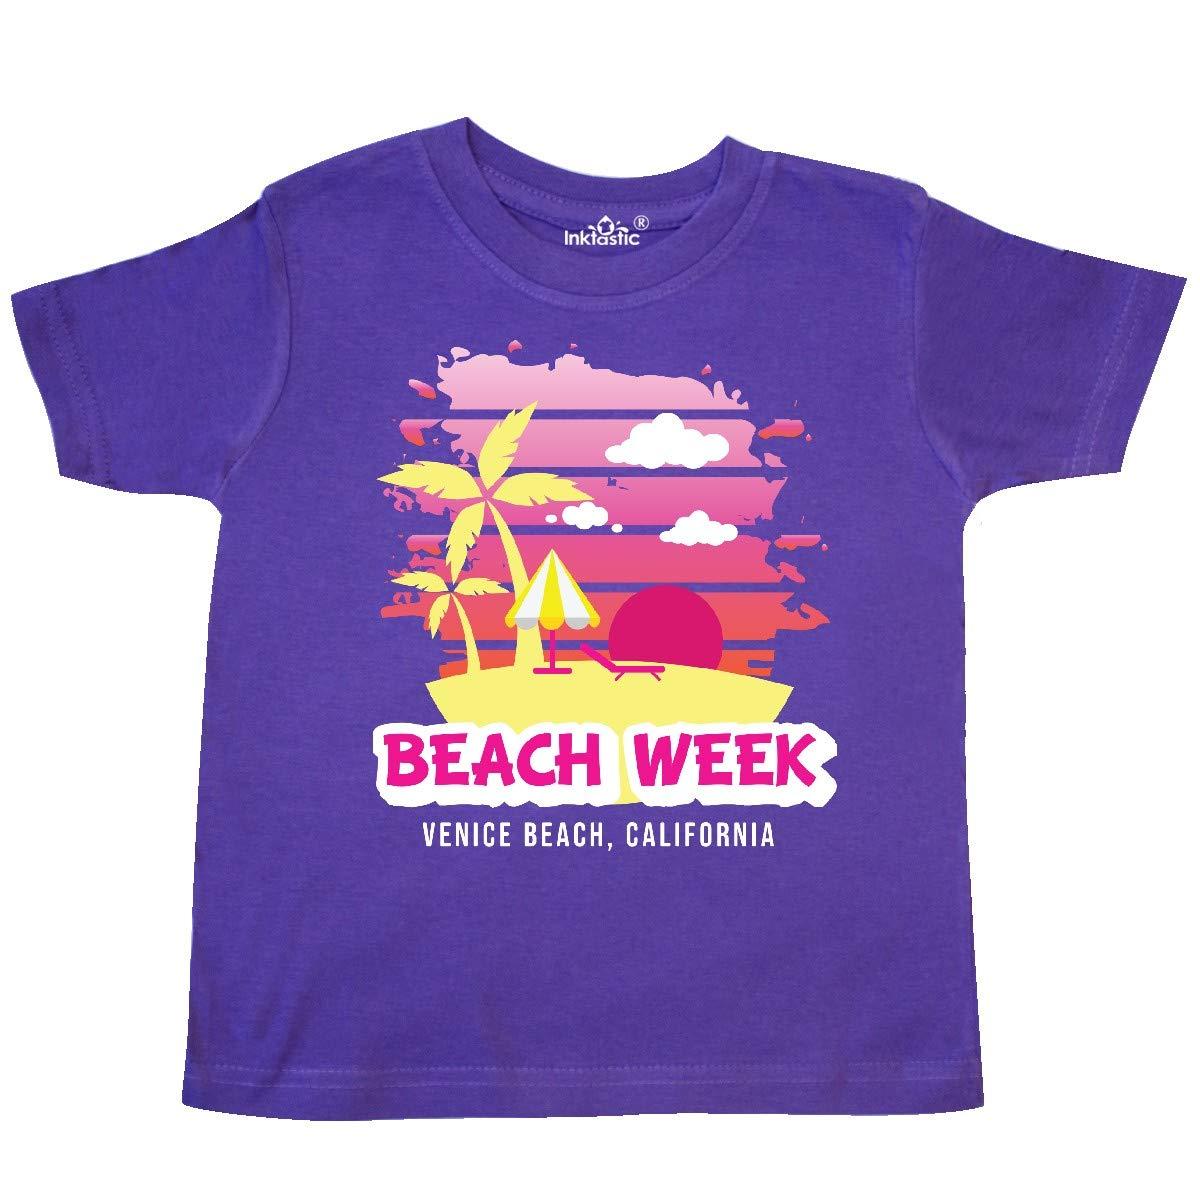 inktastic Beach Week Venice Beach California with Palm Trees Toddler T-Shirt